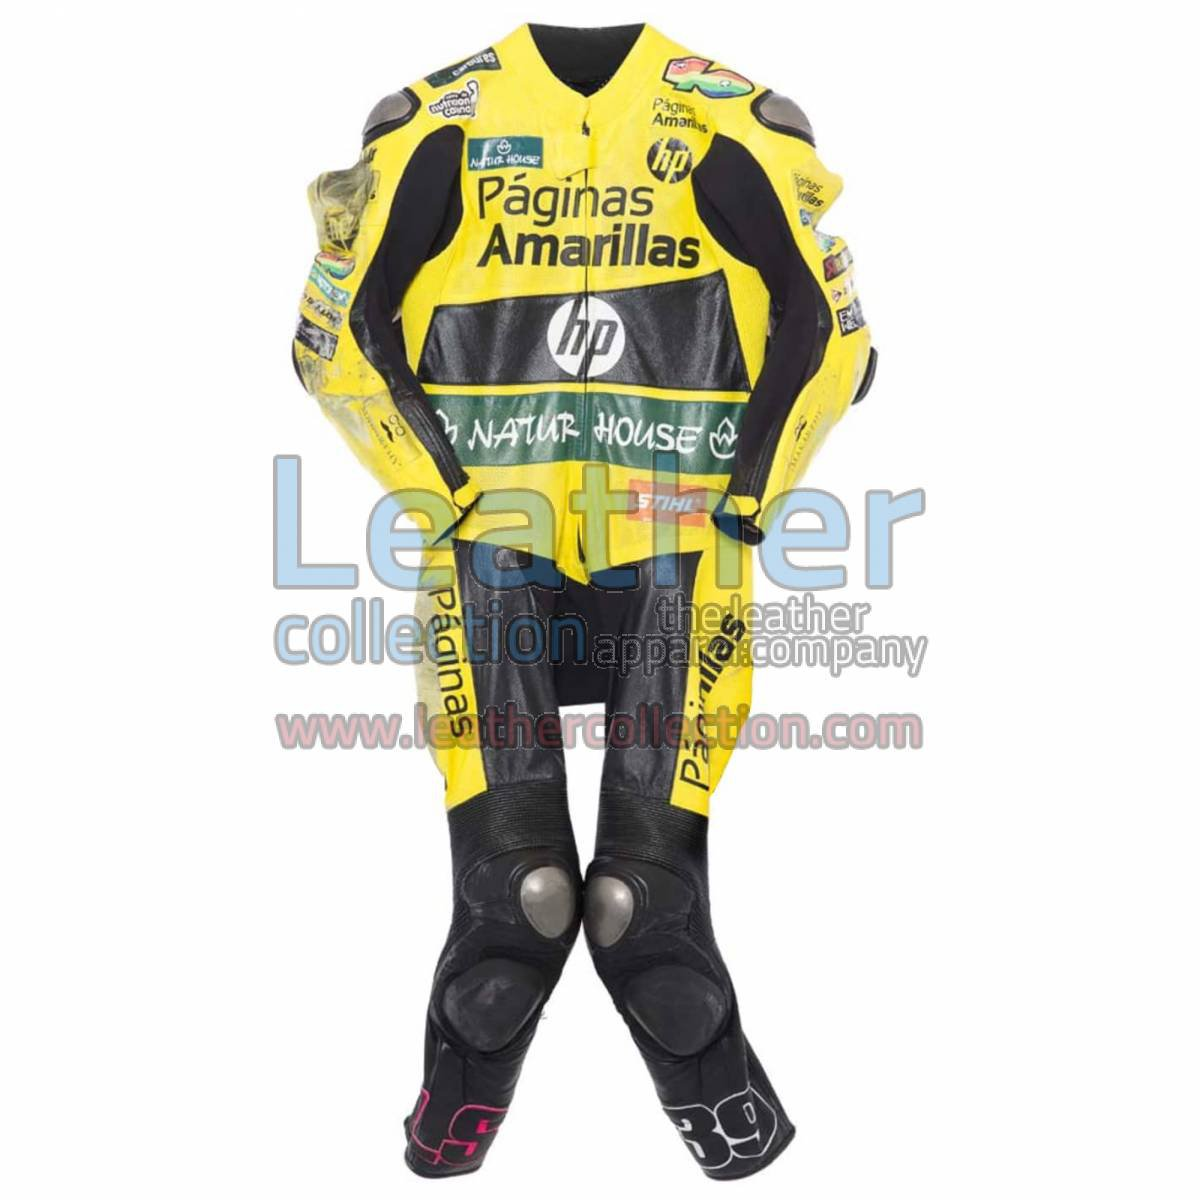 Luis Salom 2014 Motorcycle Leathers